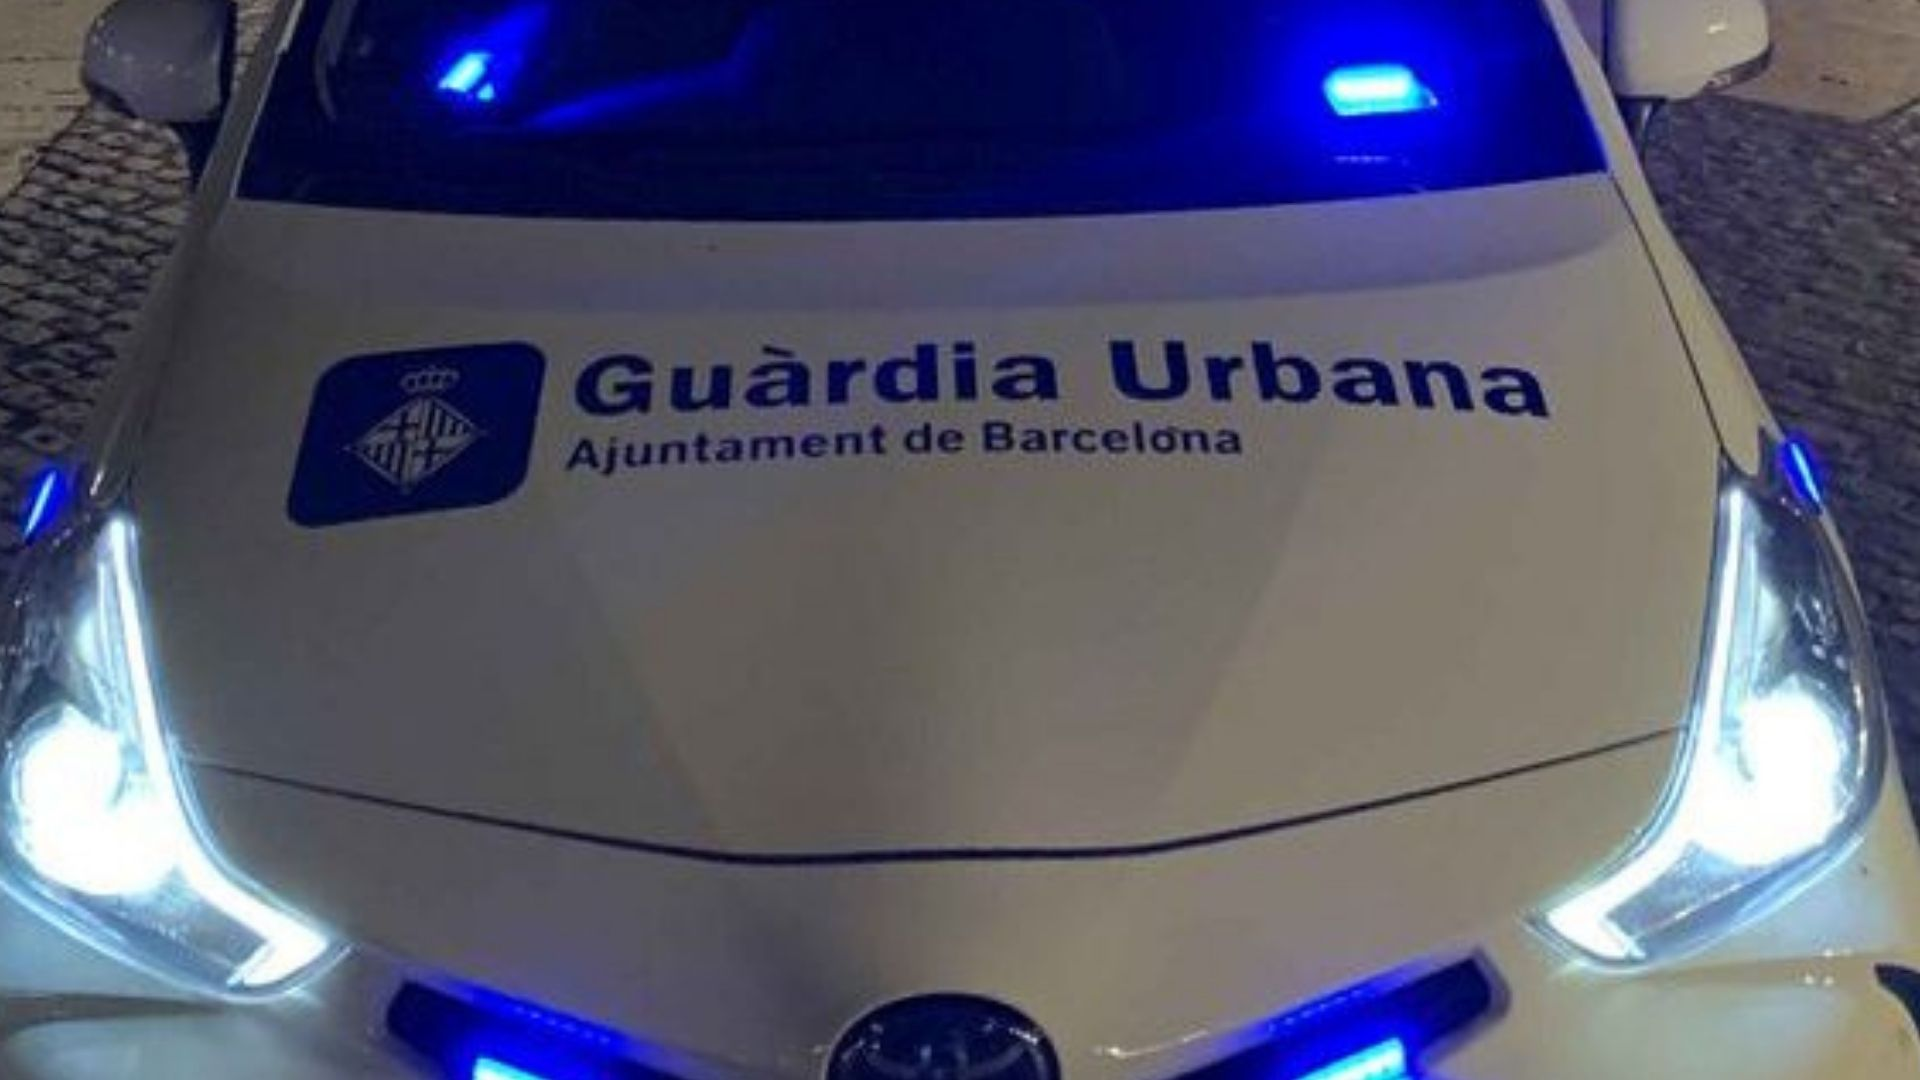 cotxe de la guàrdia urbana